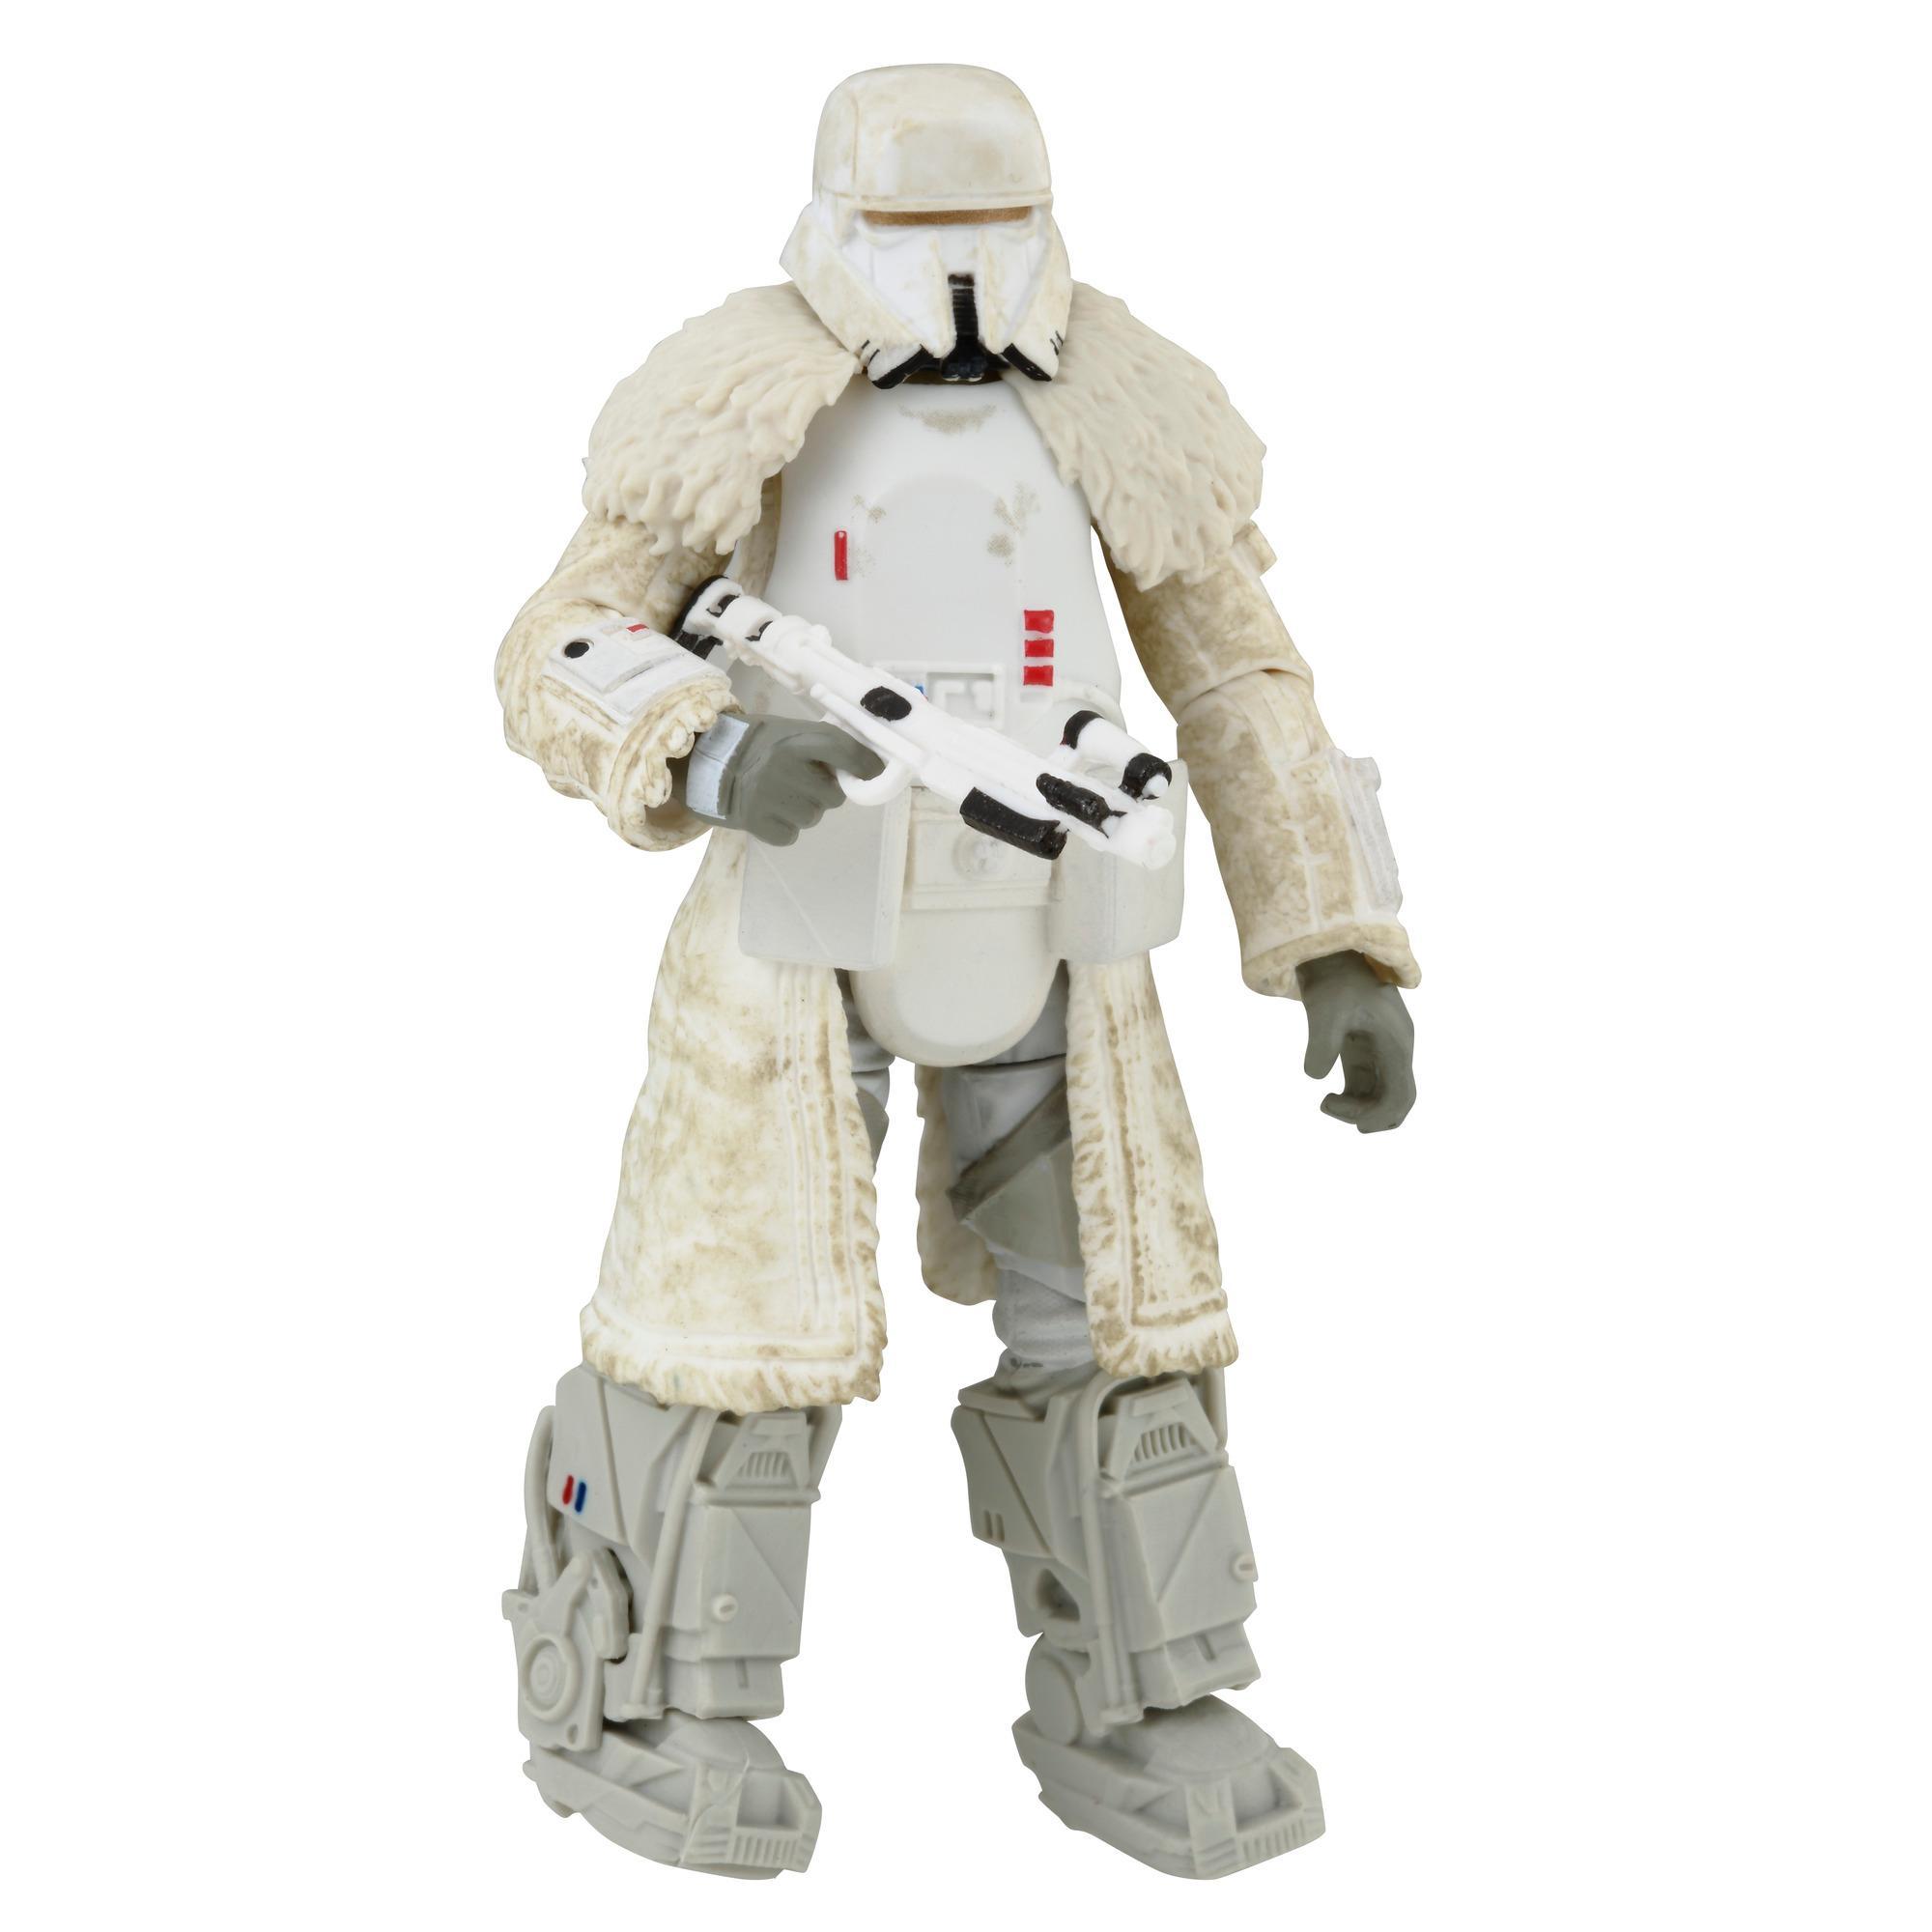 Star Wars - Collection Vintage - Figurine Trooper frontalier de 9,5 cm